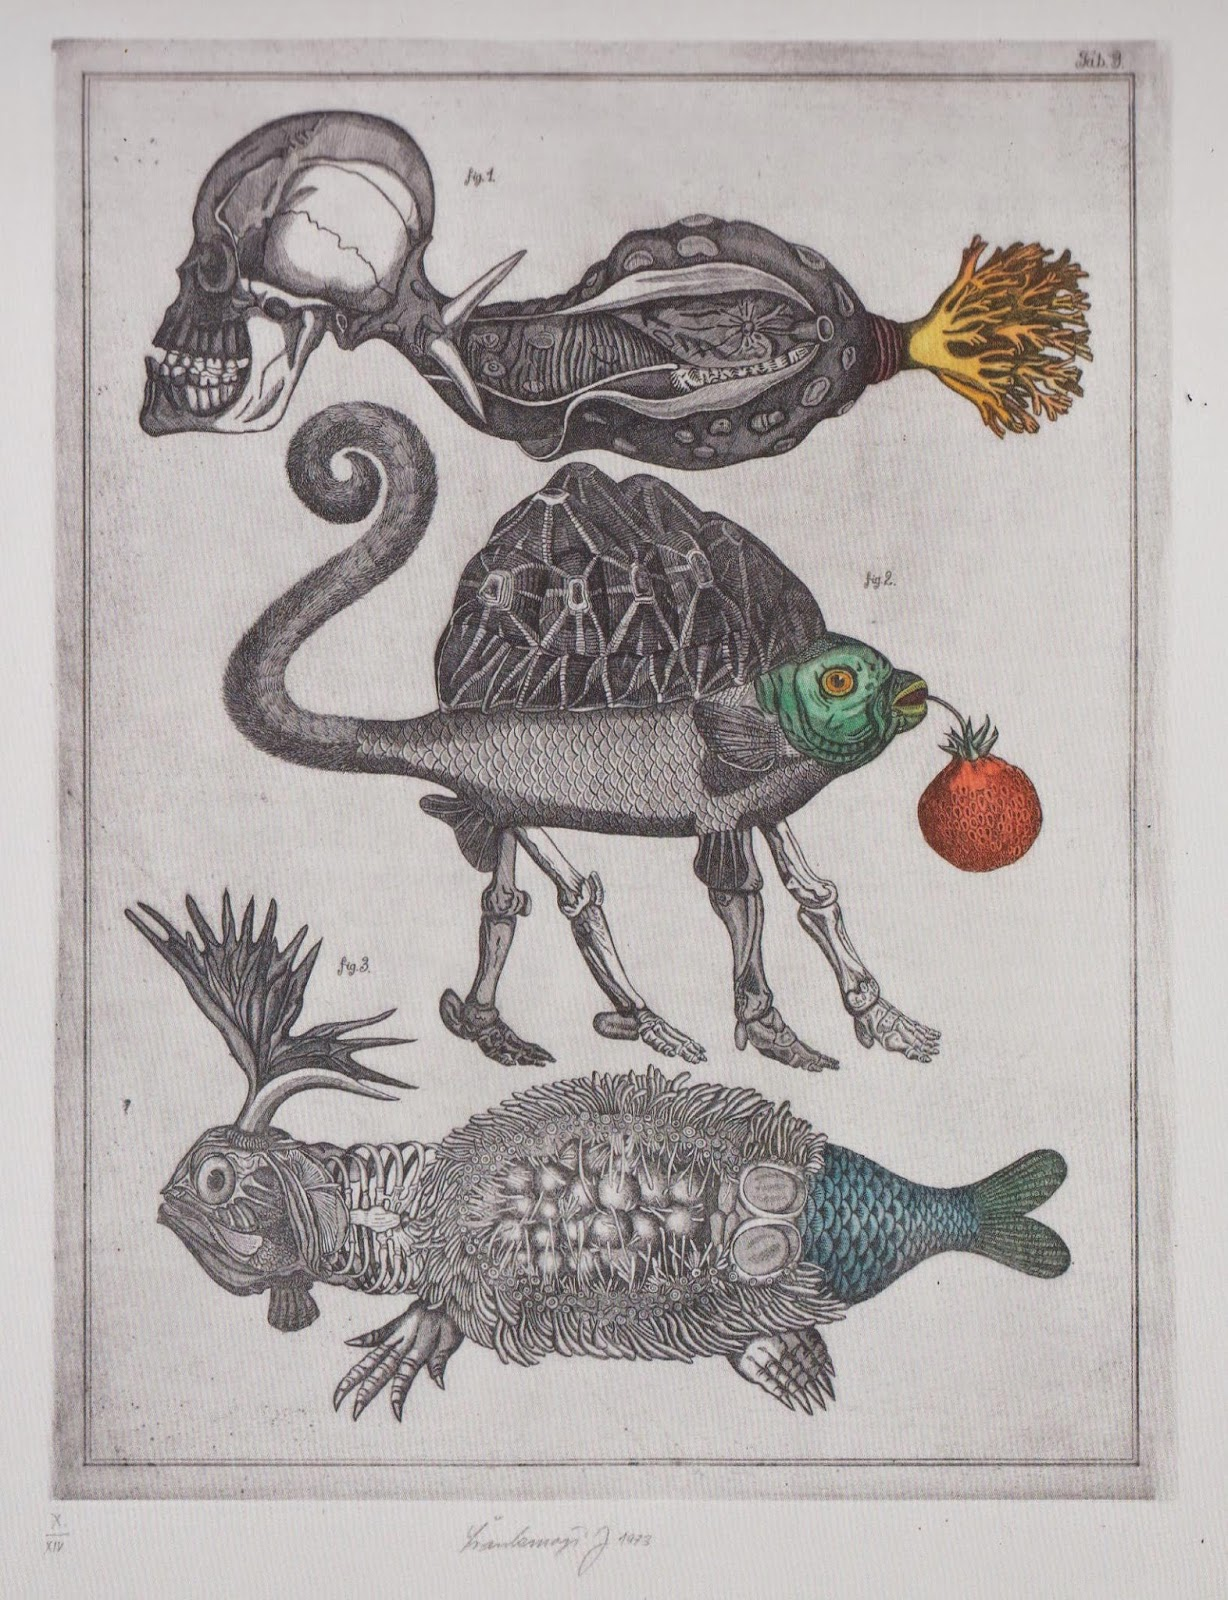 Jan Švankmajer artista surrealista